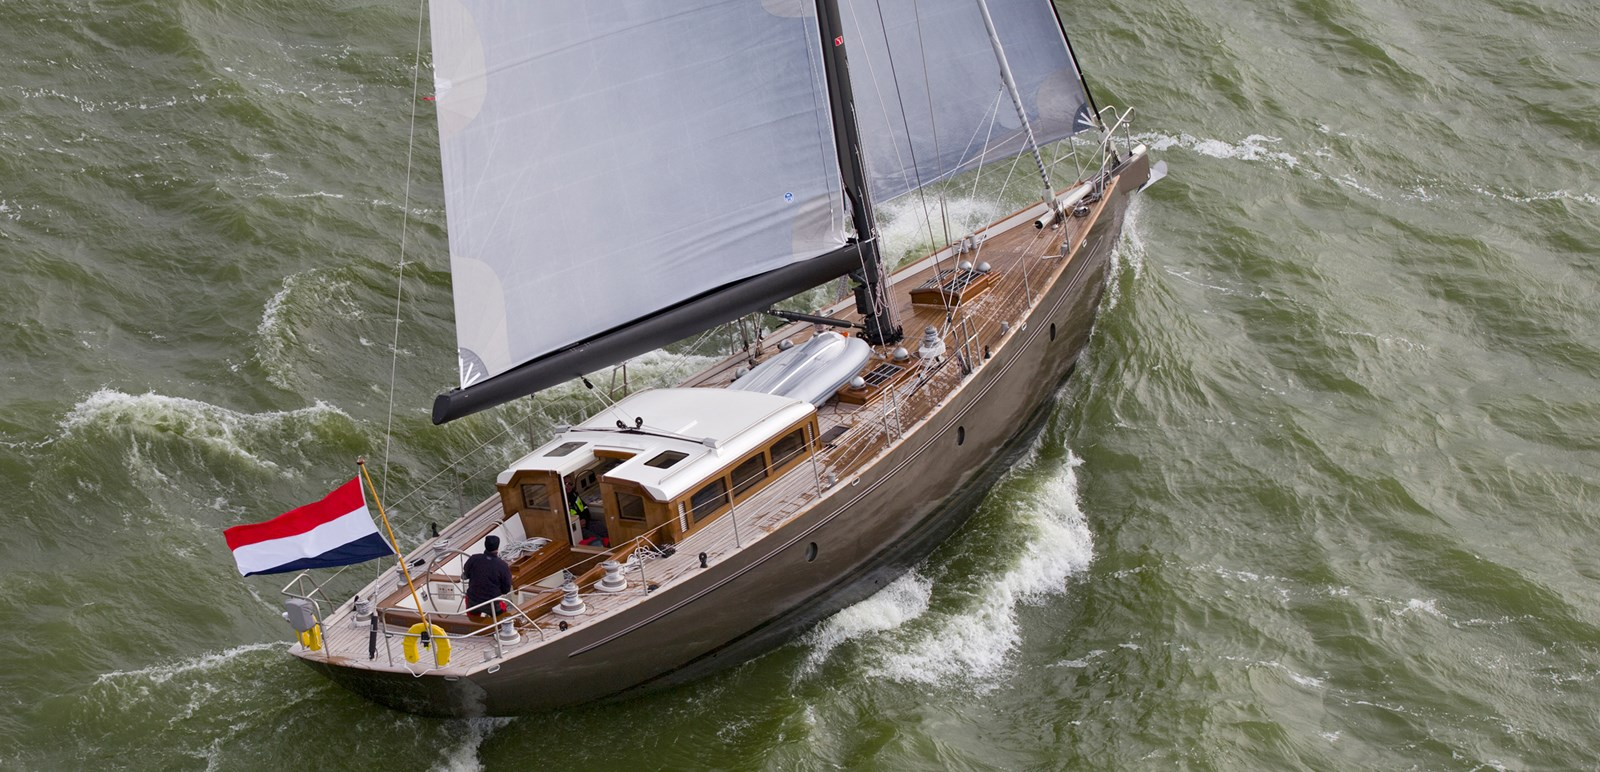 sailing 2 2012 CLAASEN SHIPYARDS Pilot Cutter Sloop 2776547